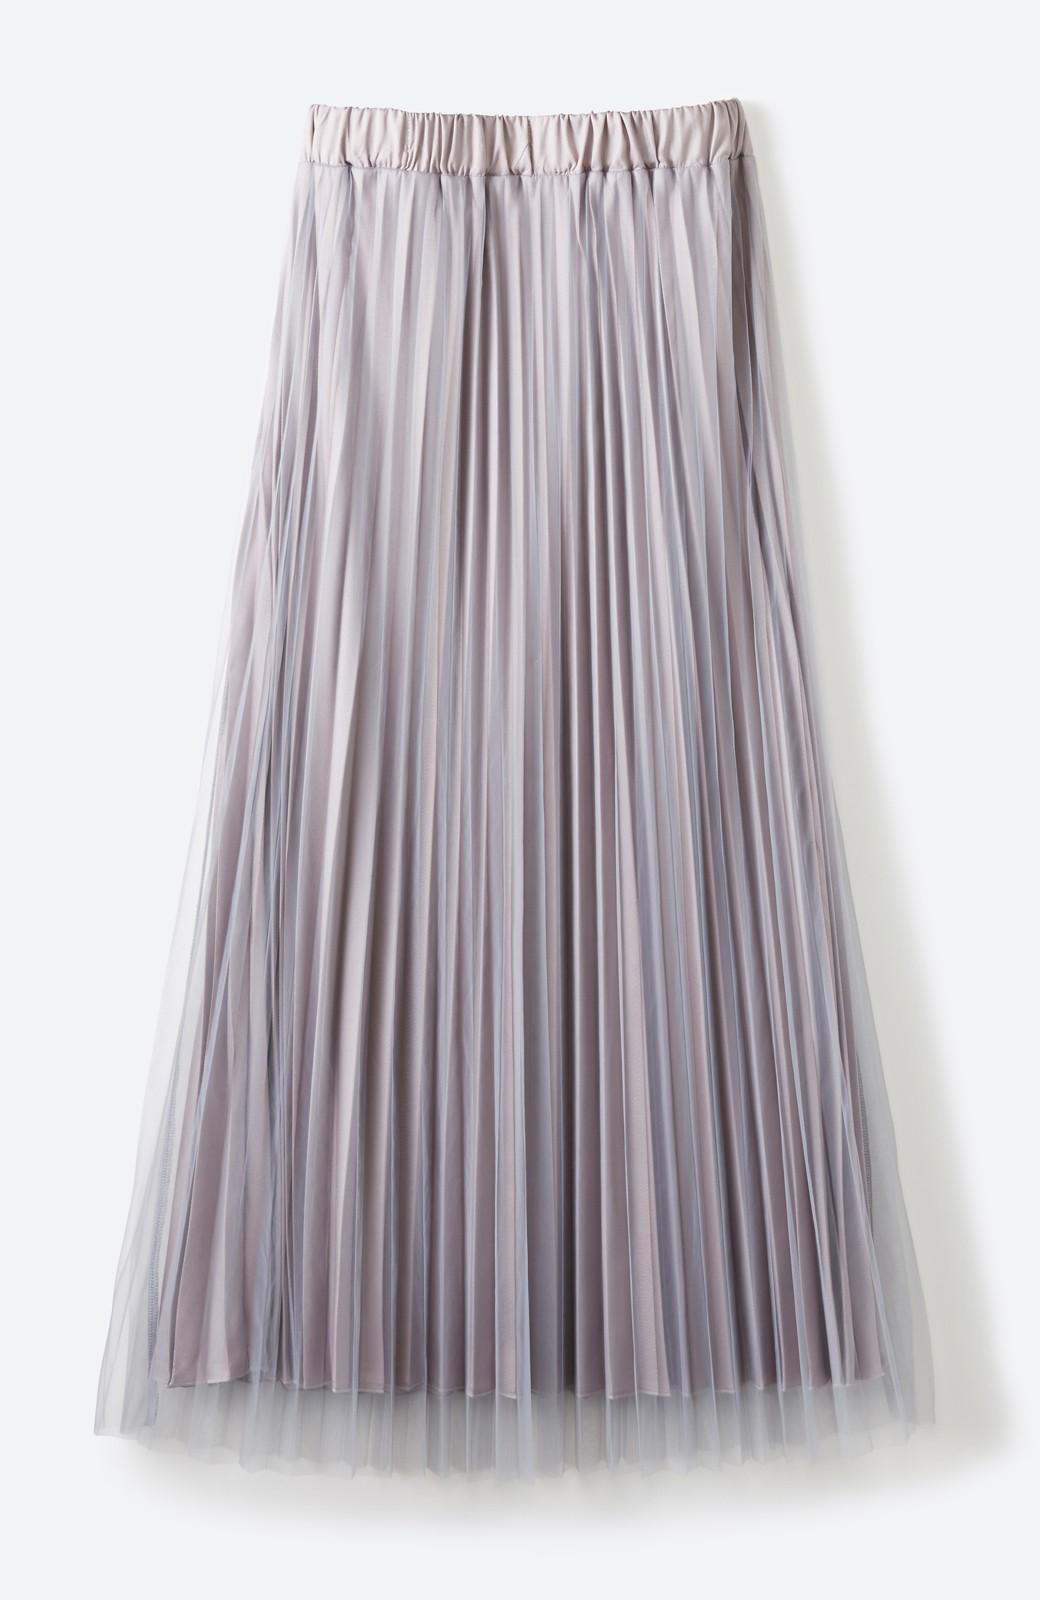 haco! どんな日も華やか気分にしてくれる 二枚仕立てのチュールプリーツスカート <ライトグレー>の商品写真1